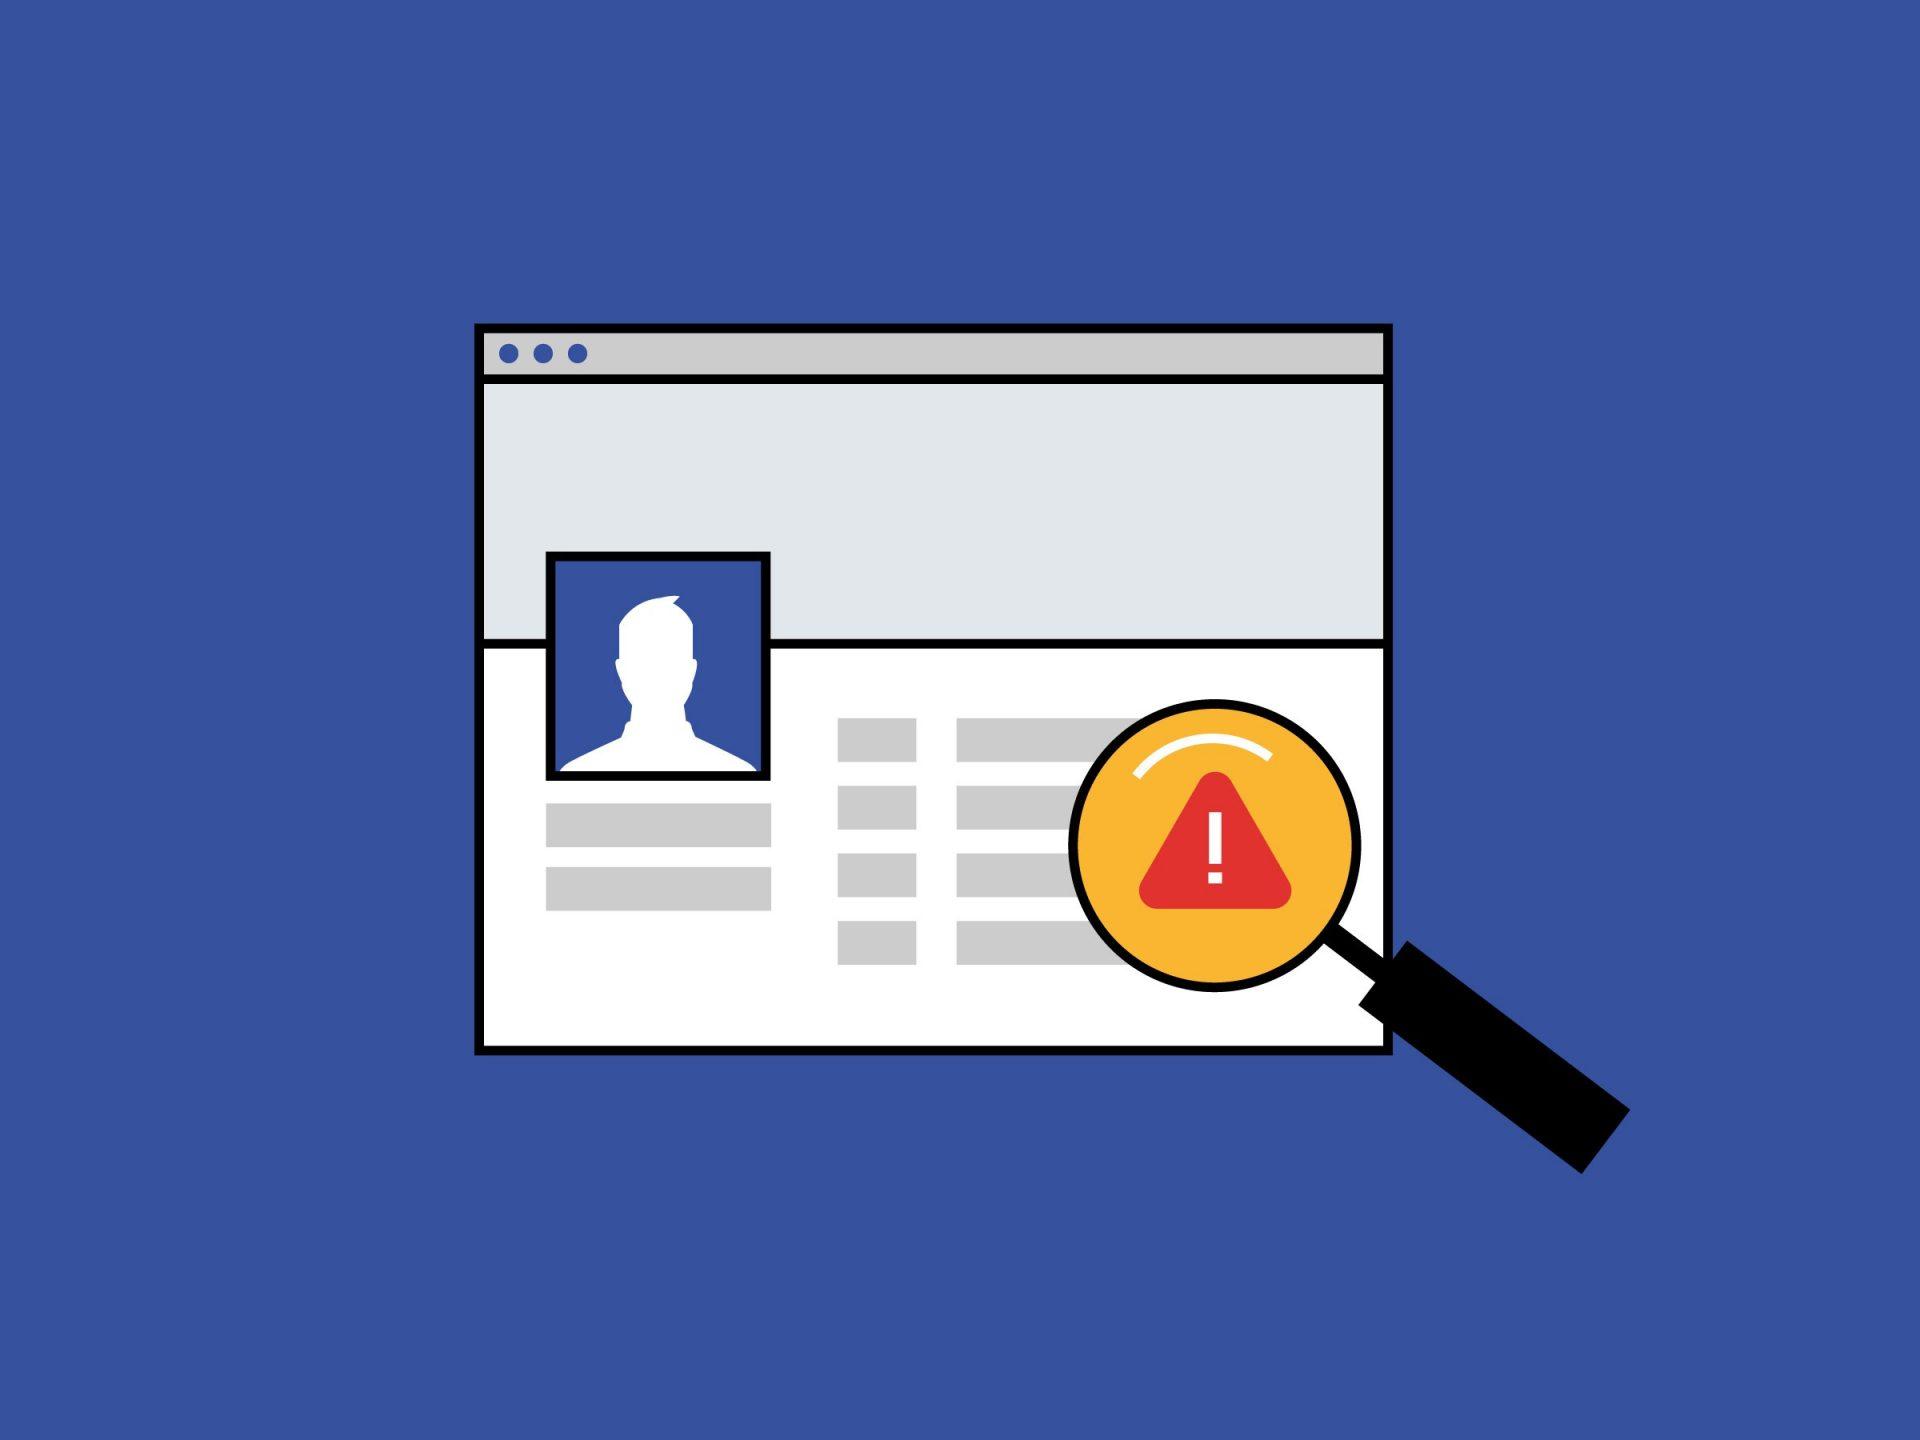 Come far scaricare l'app da Facebook